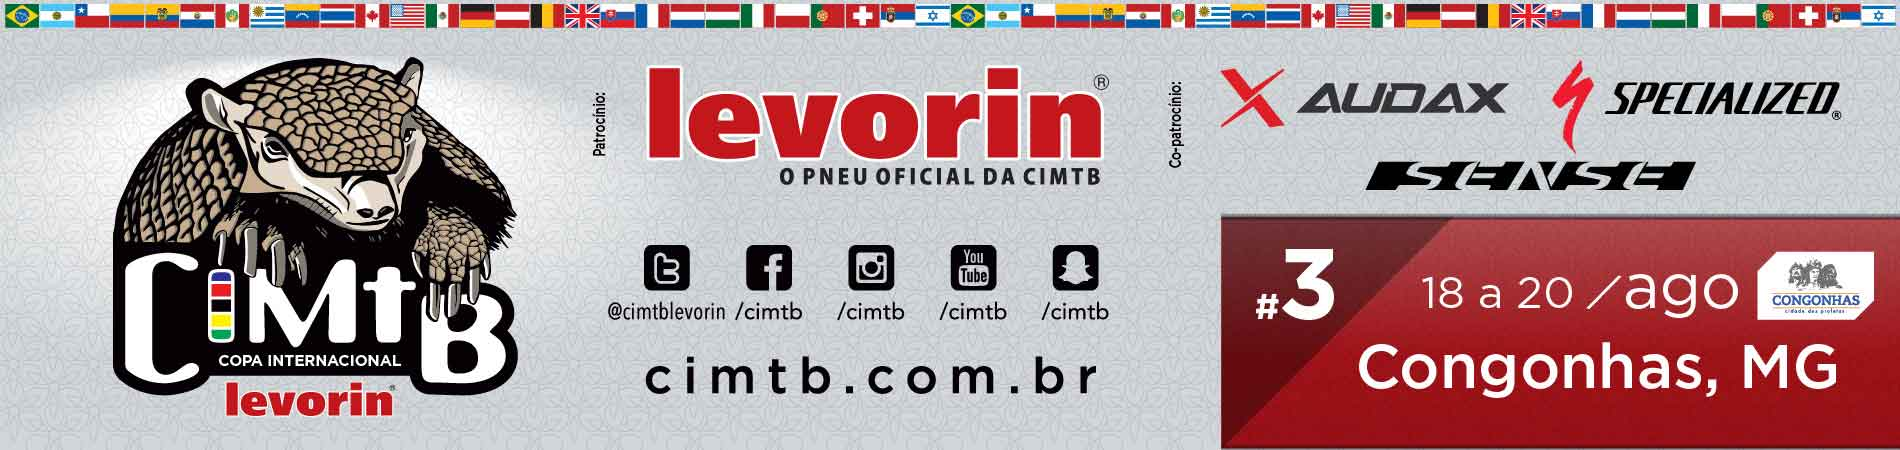 COPA INTERNACIONAL LEVORIN DE MTB - XCM CONGONHAS - Imagem de topo